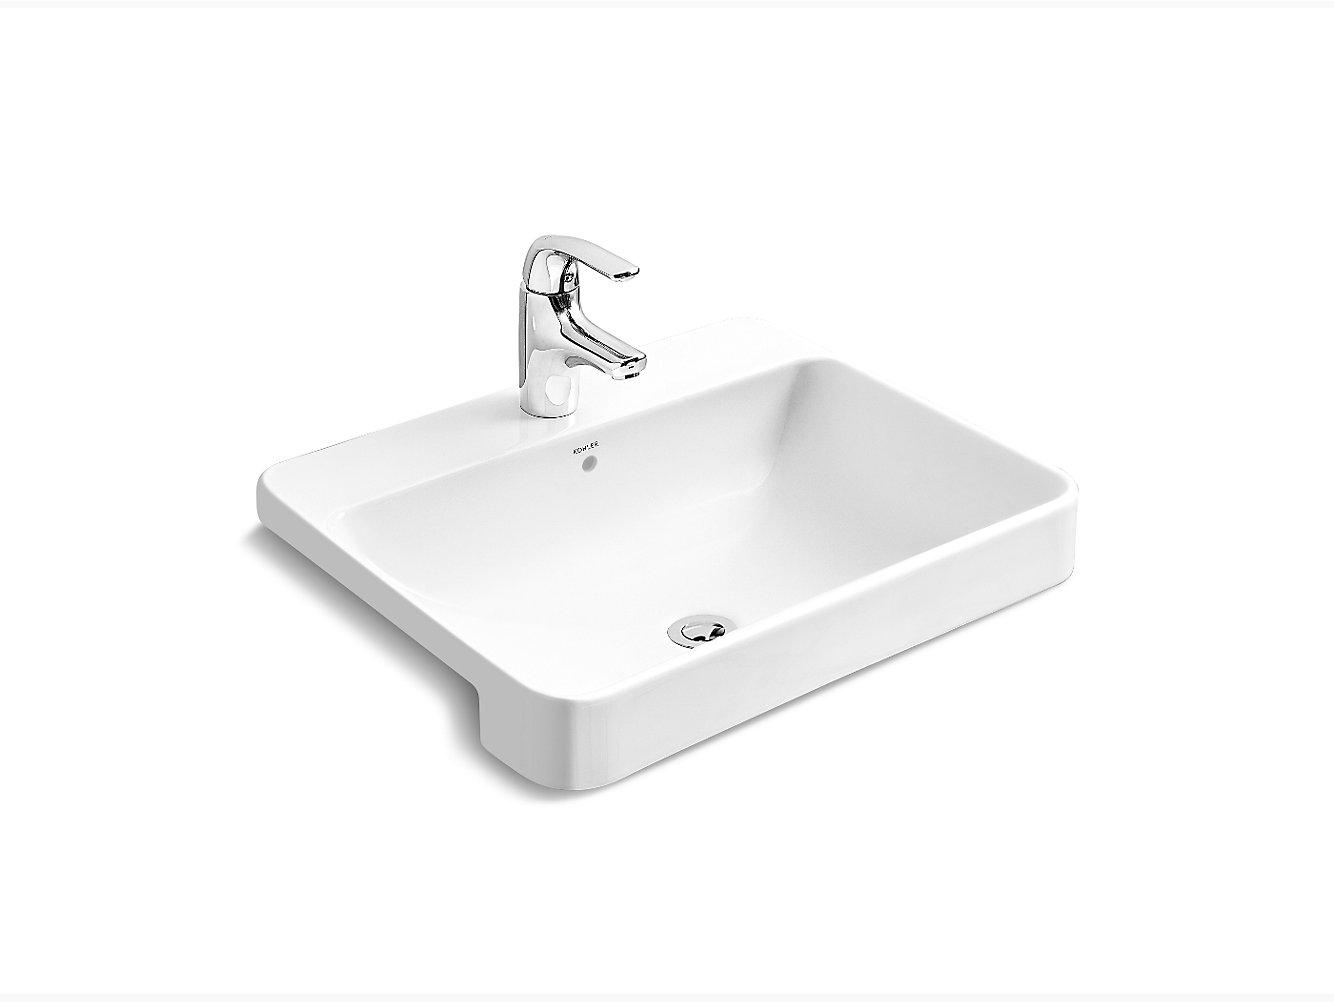 Bathroom Sinks Undermount Pedestal Amp More Bathroom Vanities With Rectangular Sinks